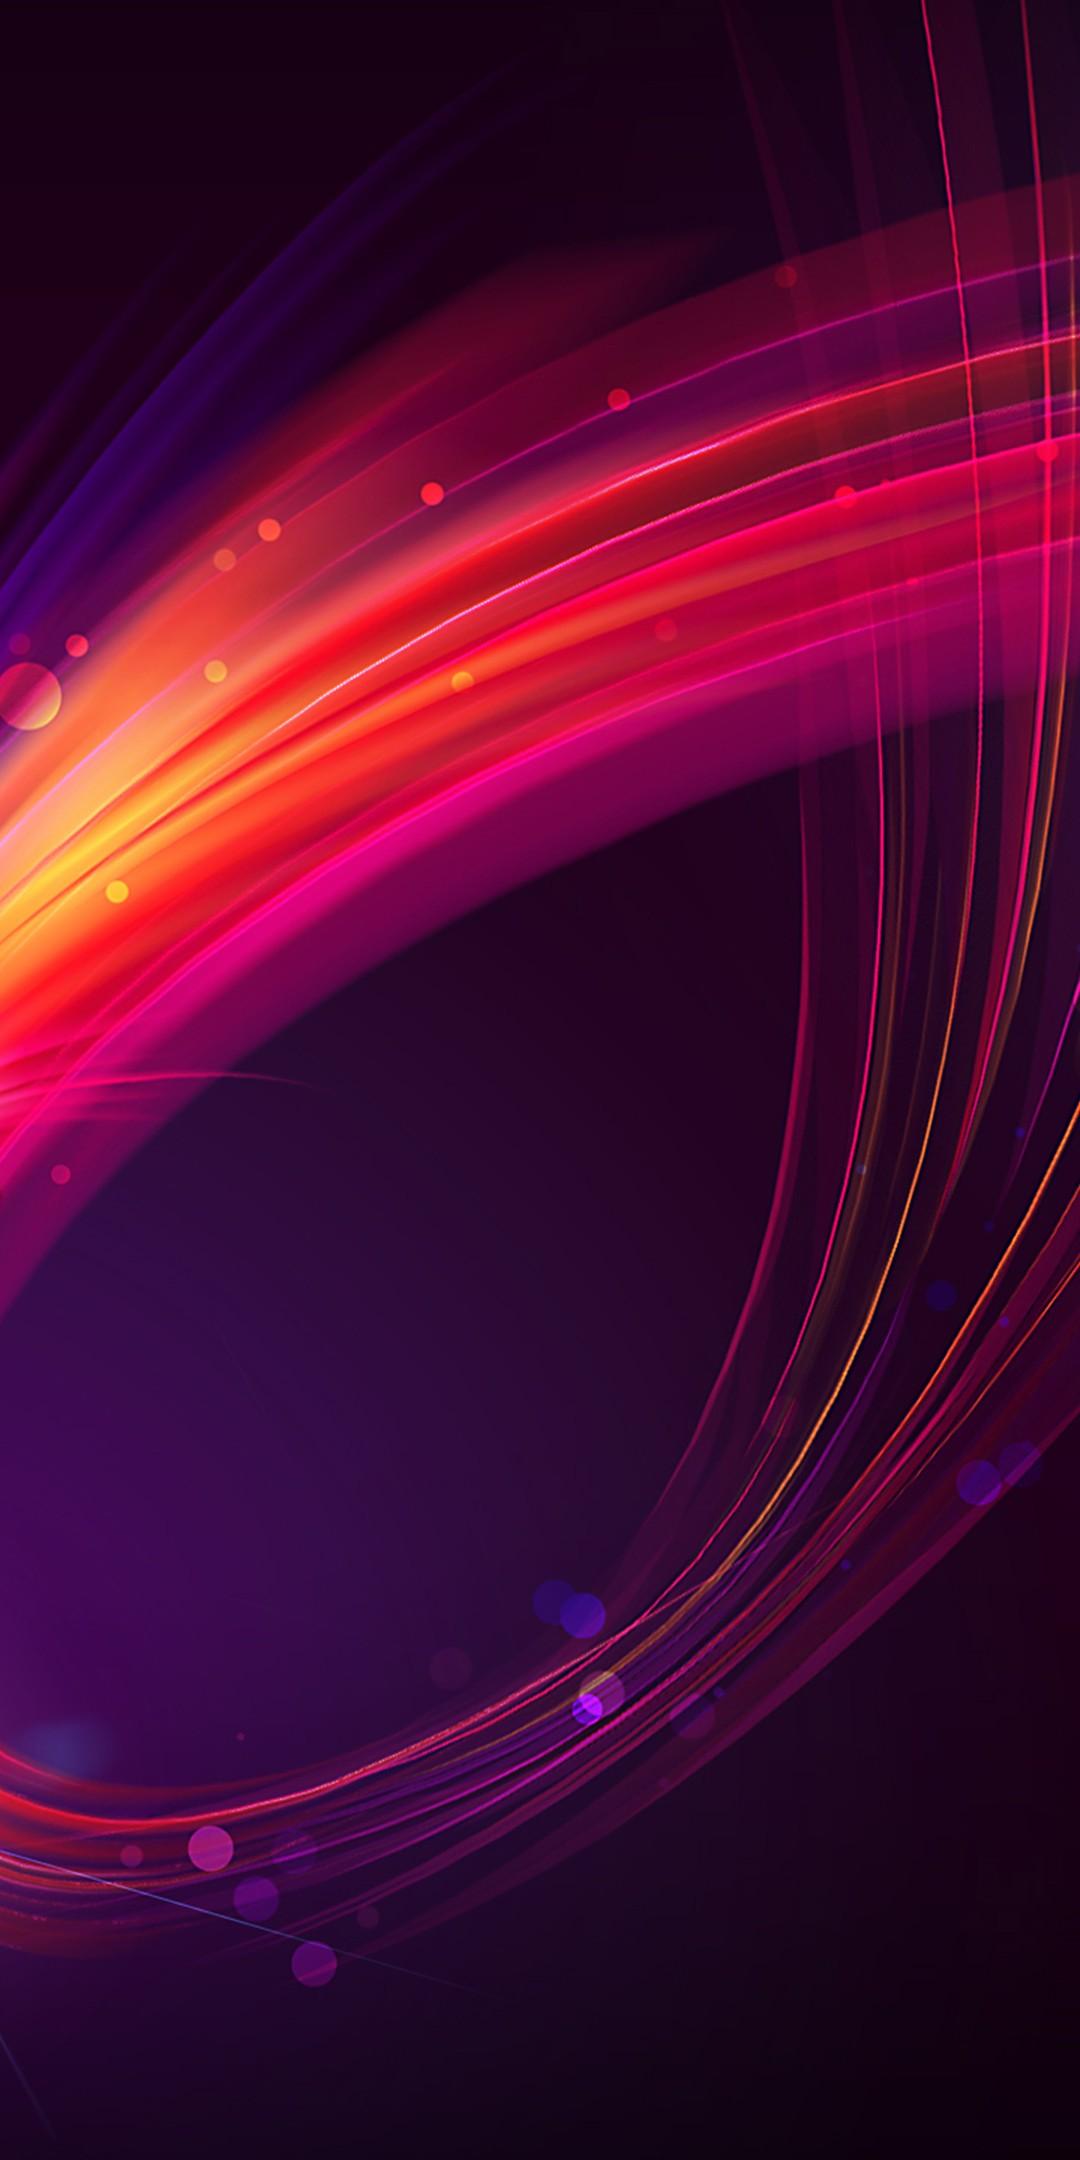 HuaweiMate10ProStockWallpaper021080x2160